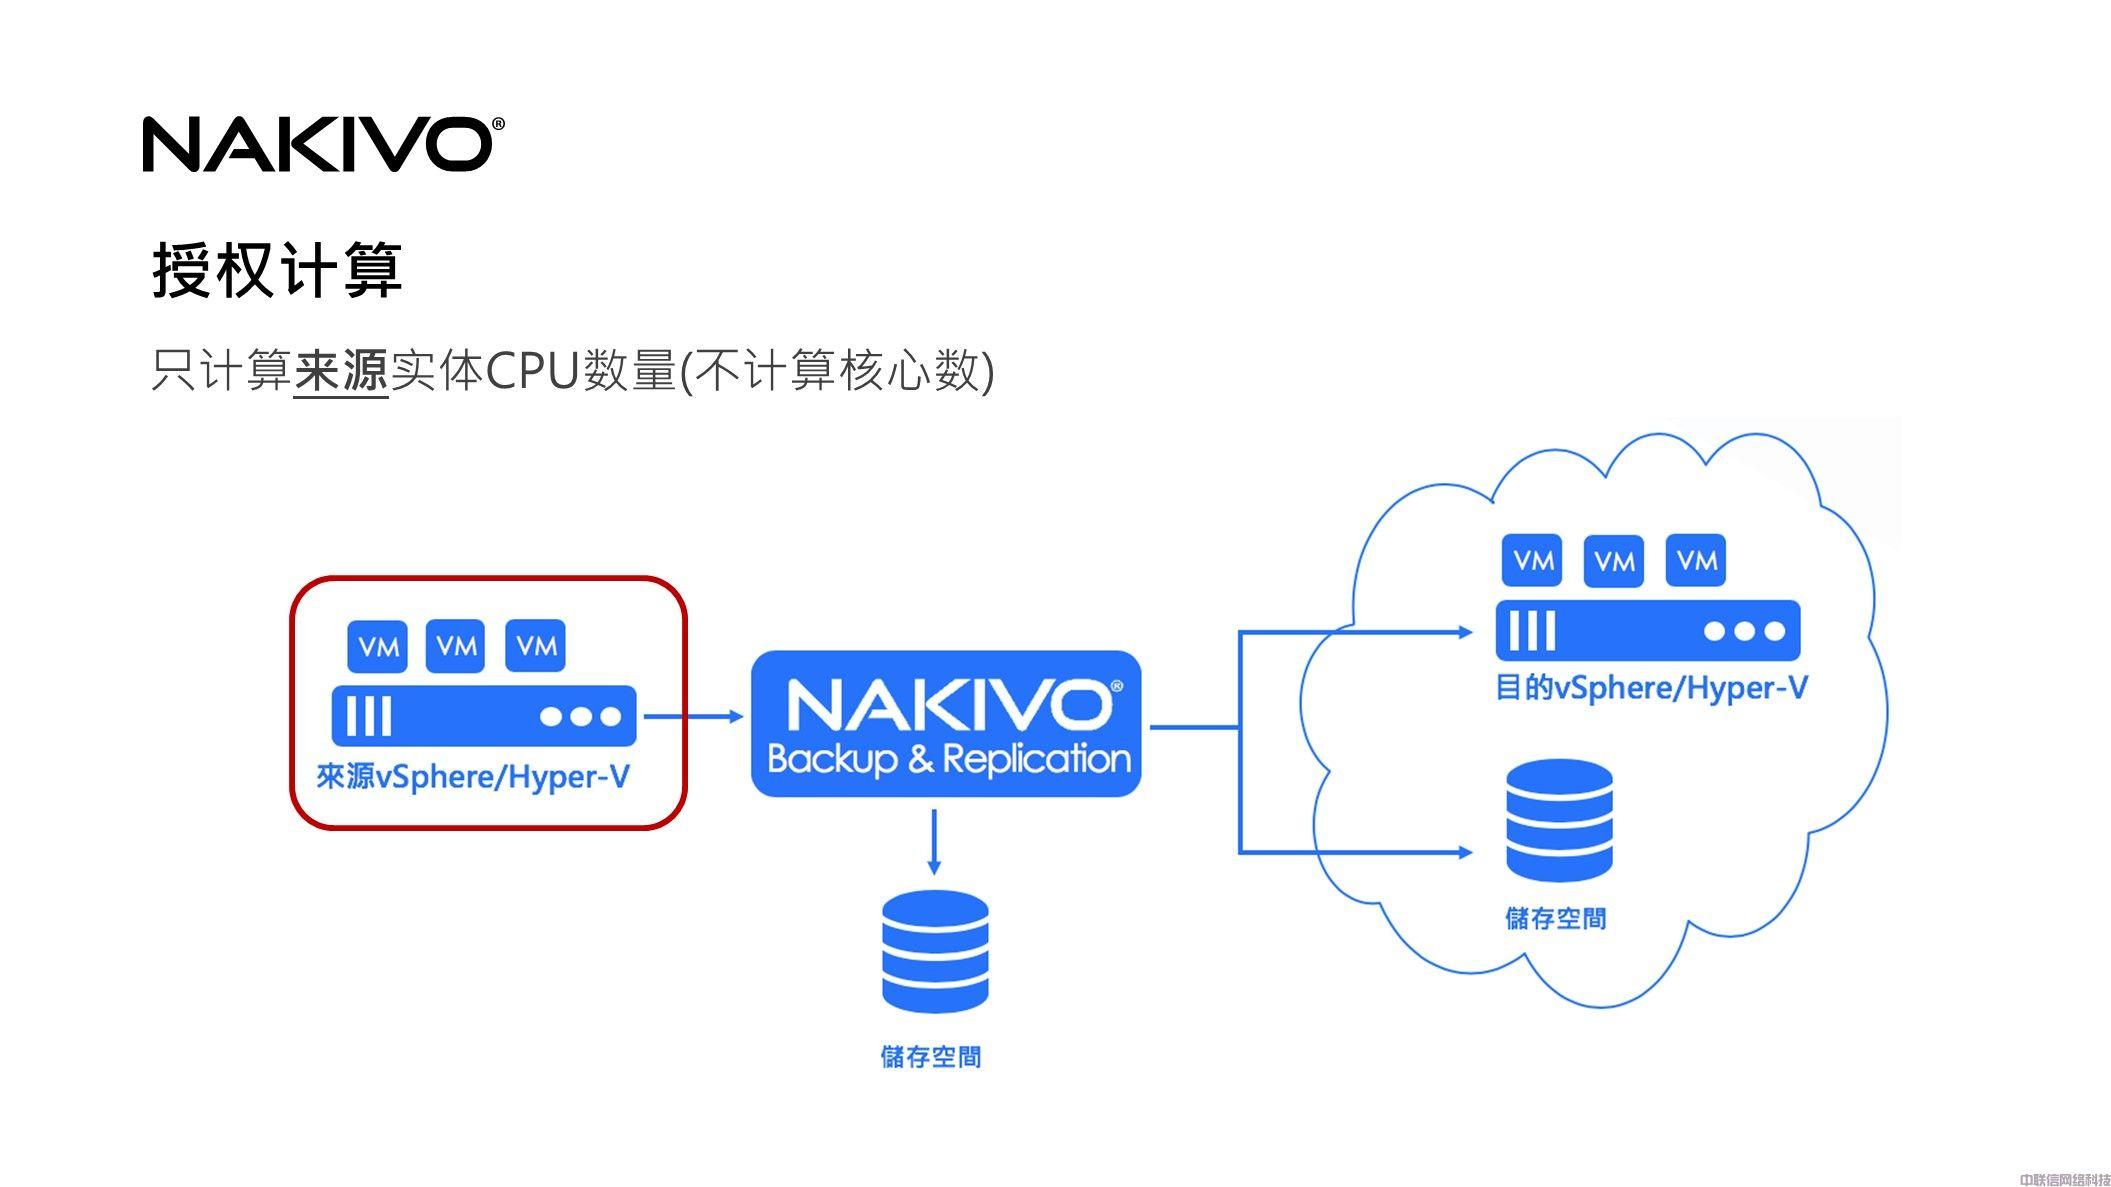 虚拟化备份方案NAKIVO Backup & Replication(图41)